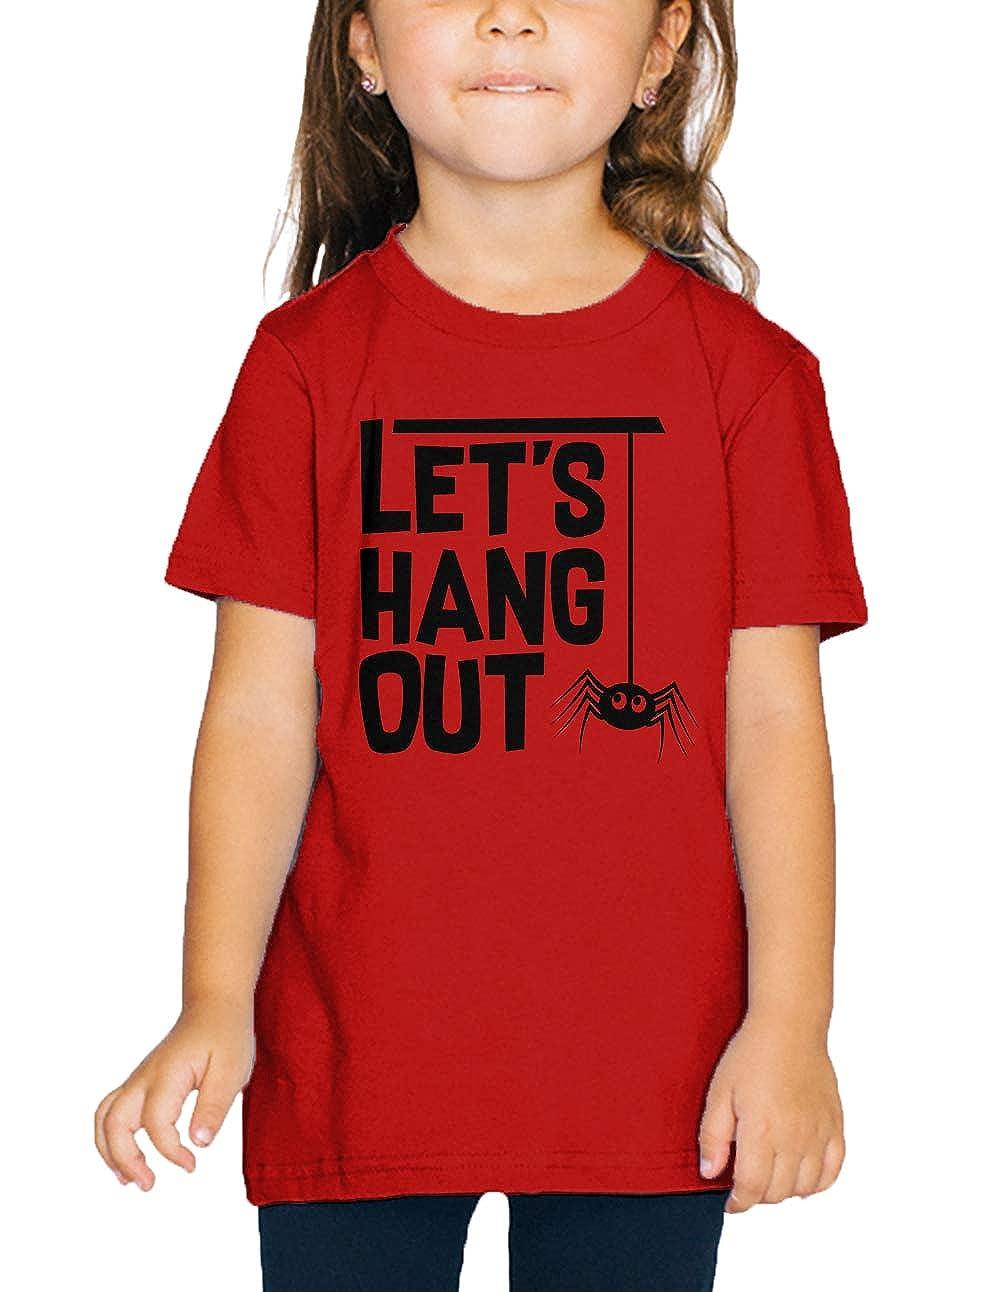 SpiritForged Apparel Lets Hang Out Spider Toddler T-Shirt